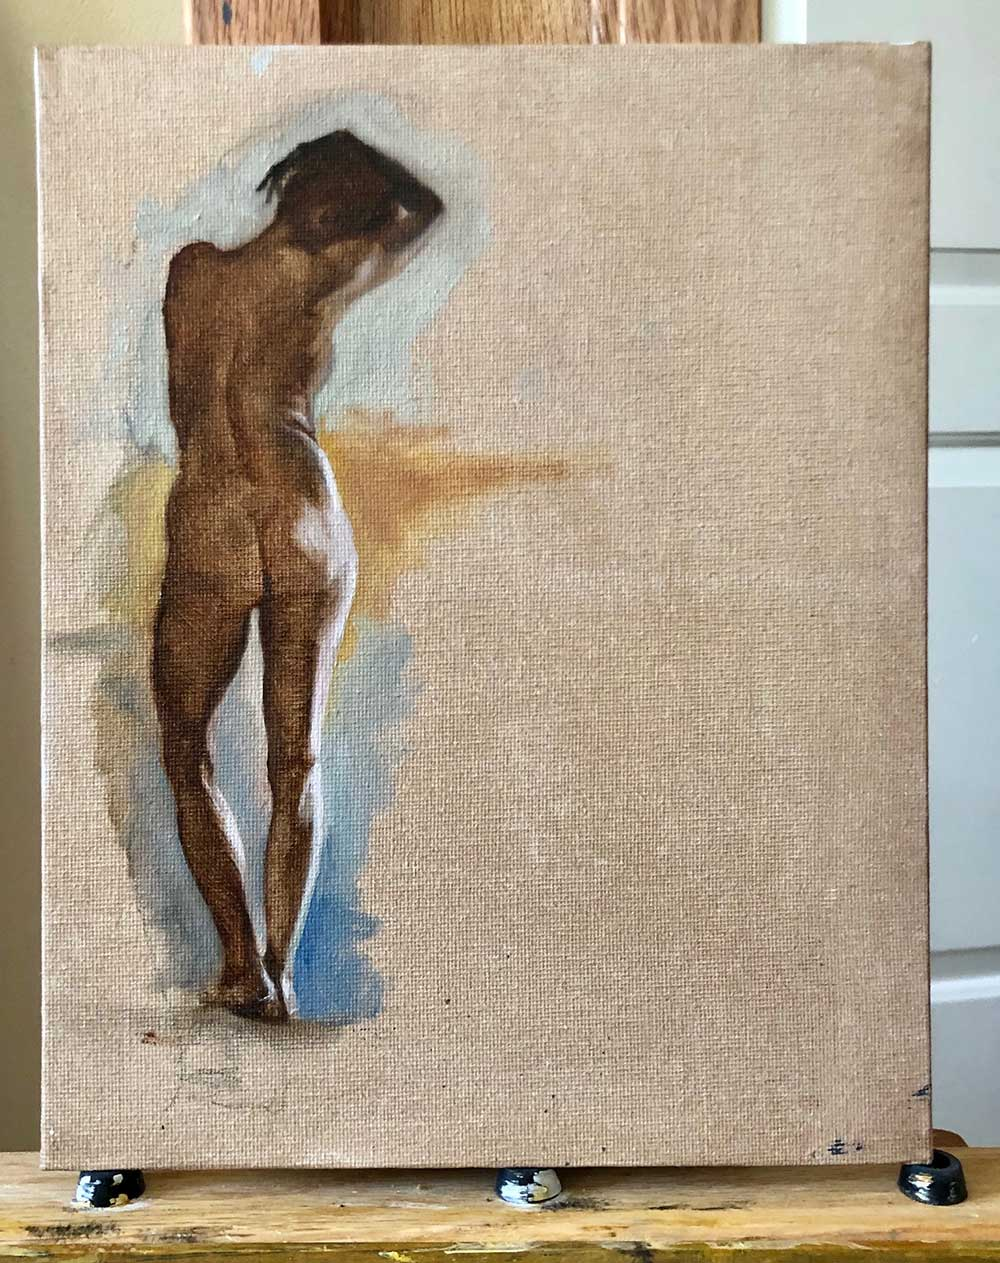 justina-vail-evans-nude-woman-standing